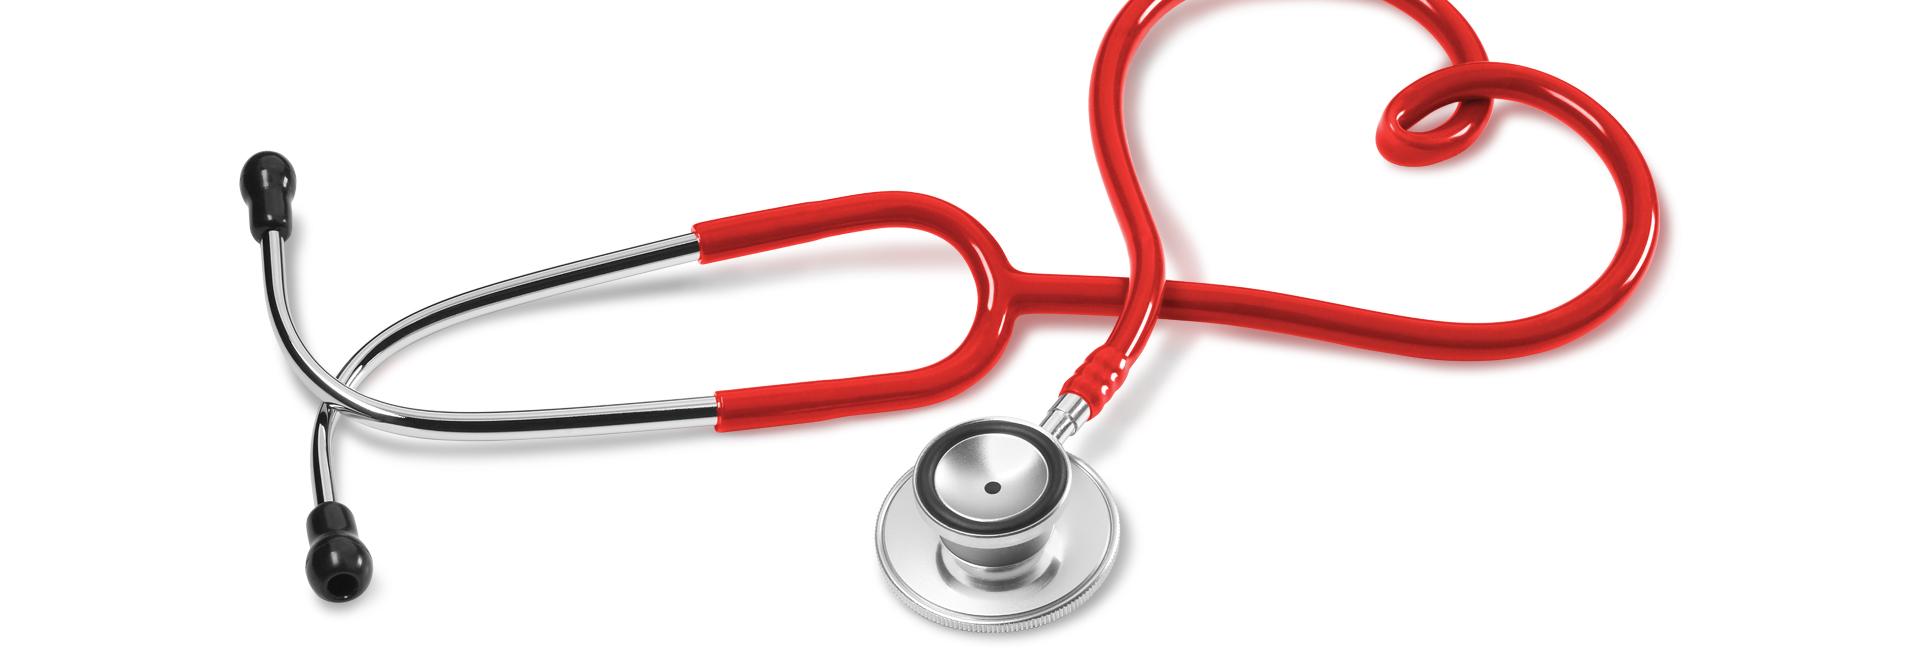 heartstethoscope